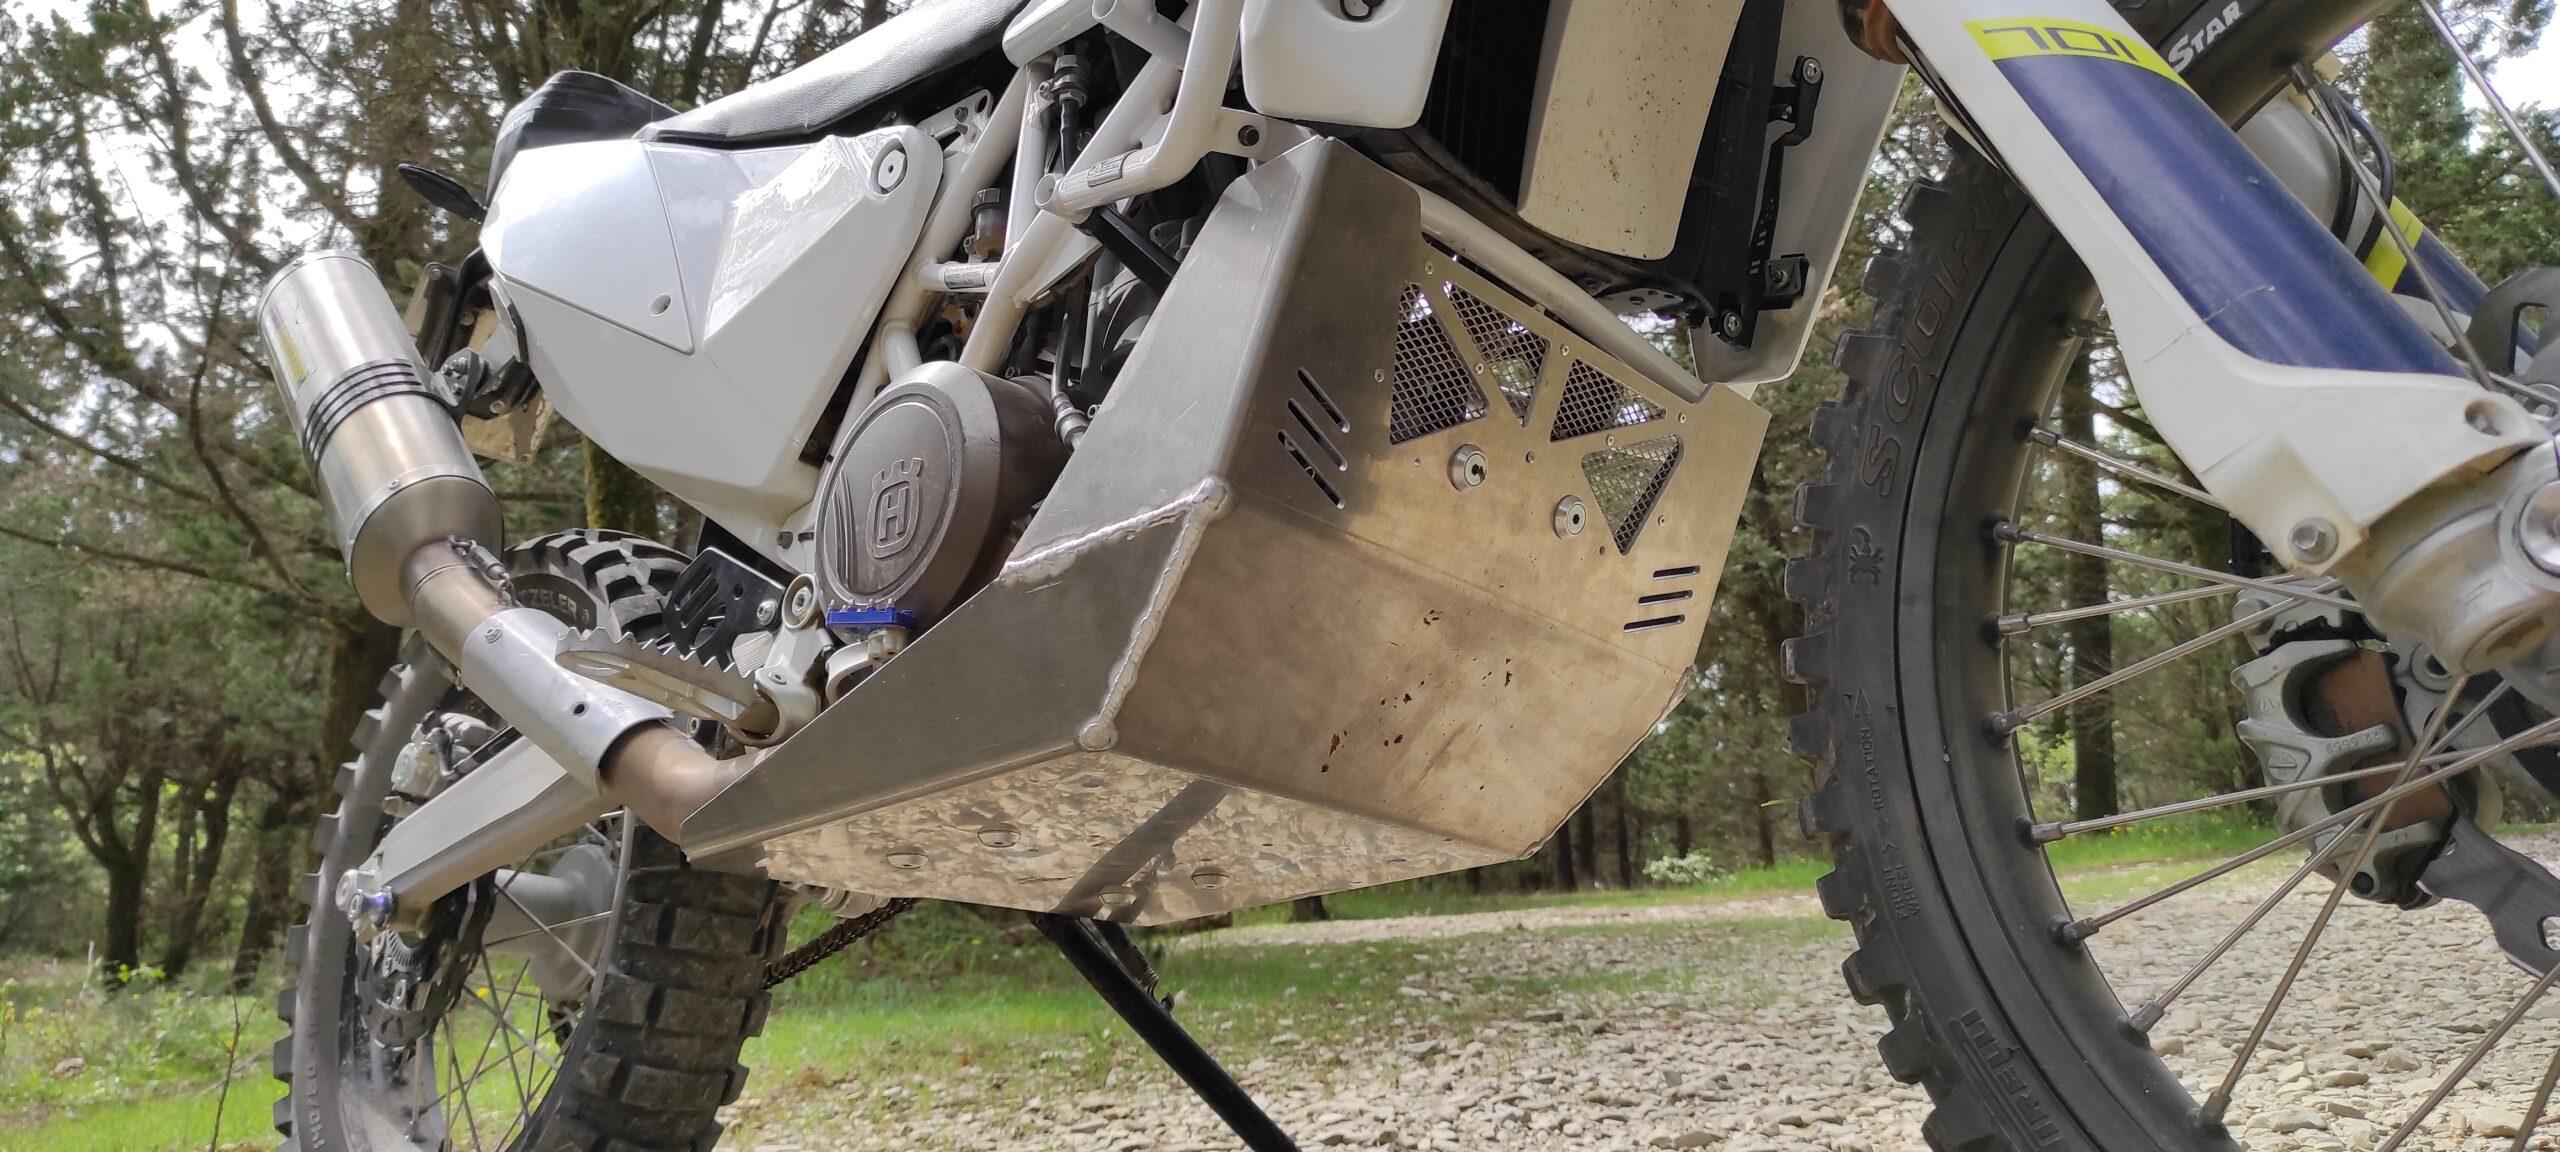 Paramotore skid plate rally style